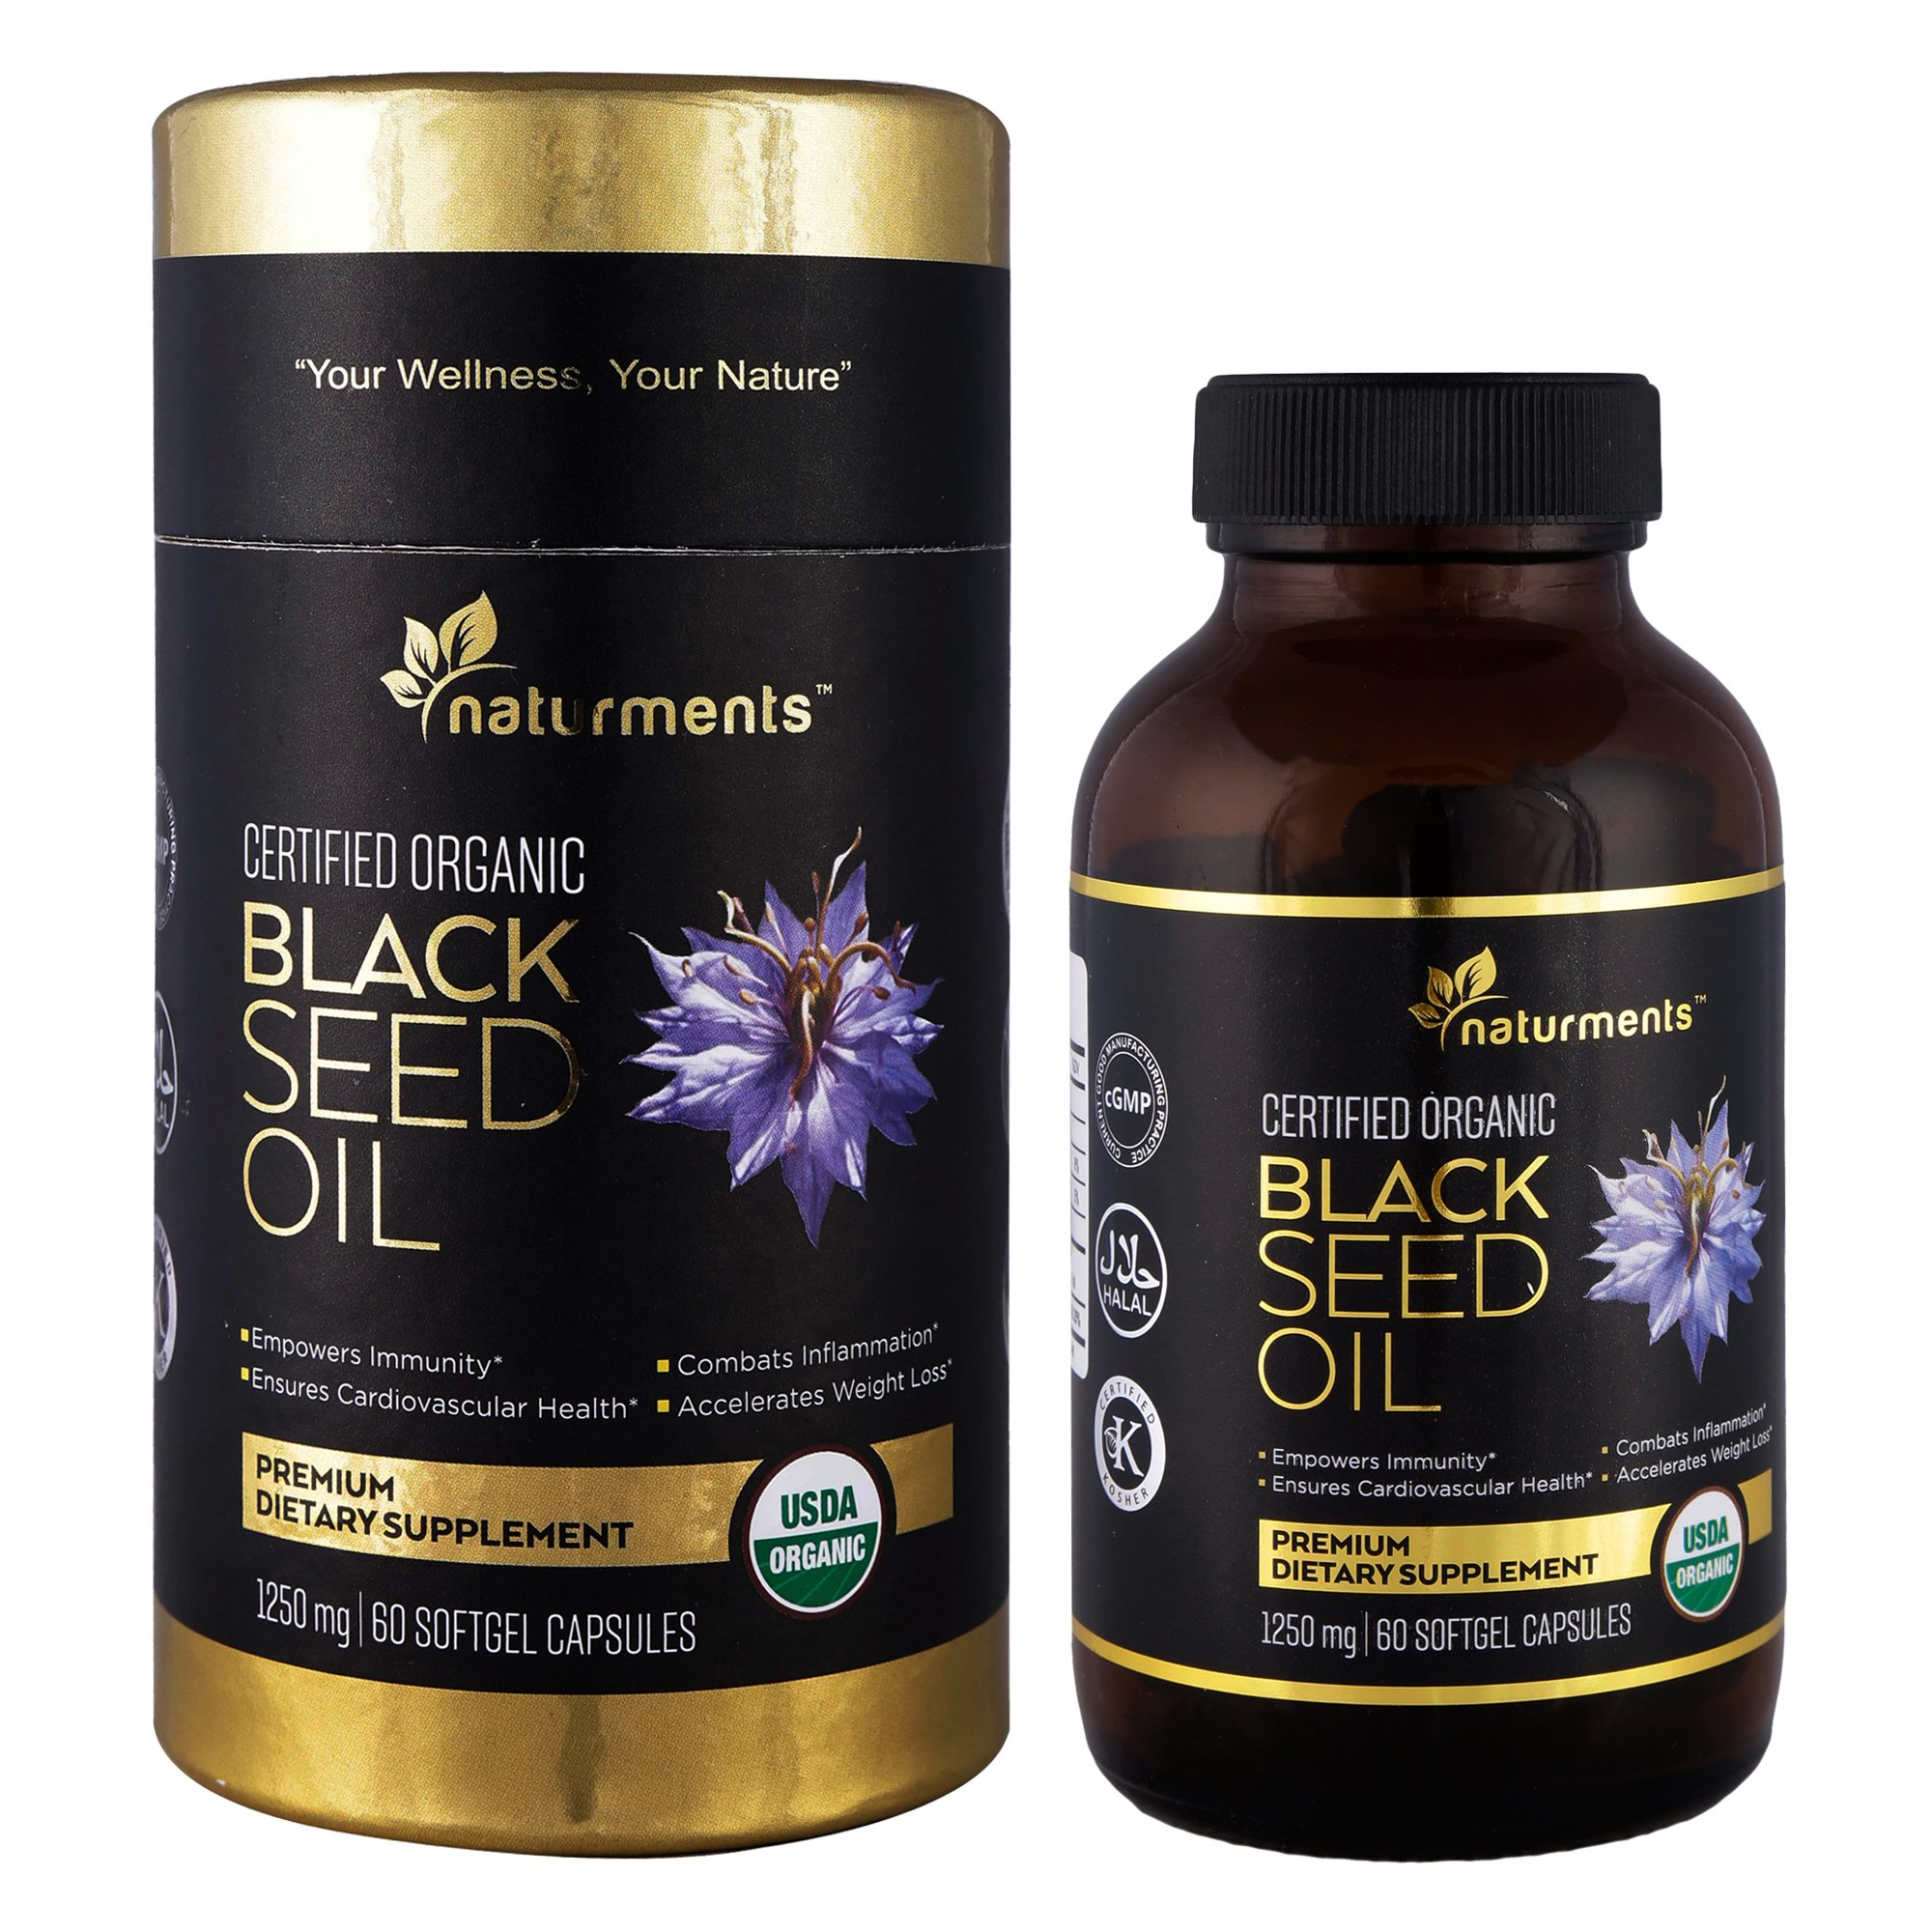 Black Cumin Seed Oil Capsules: 1250 Mg Organic, Unrefined, Cold Pressed, Extra Virgin Nigella Sativa Premium Dietary Supplement - Pure, Non GMO, Kosher, Halal Kalonji Oil - 60 Softgels